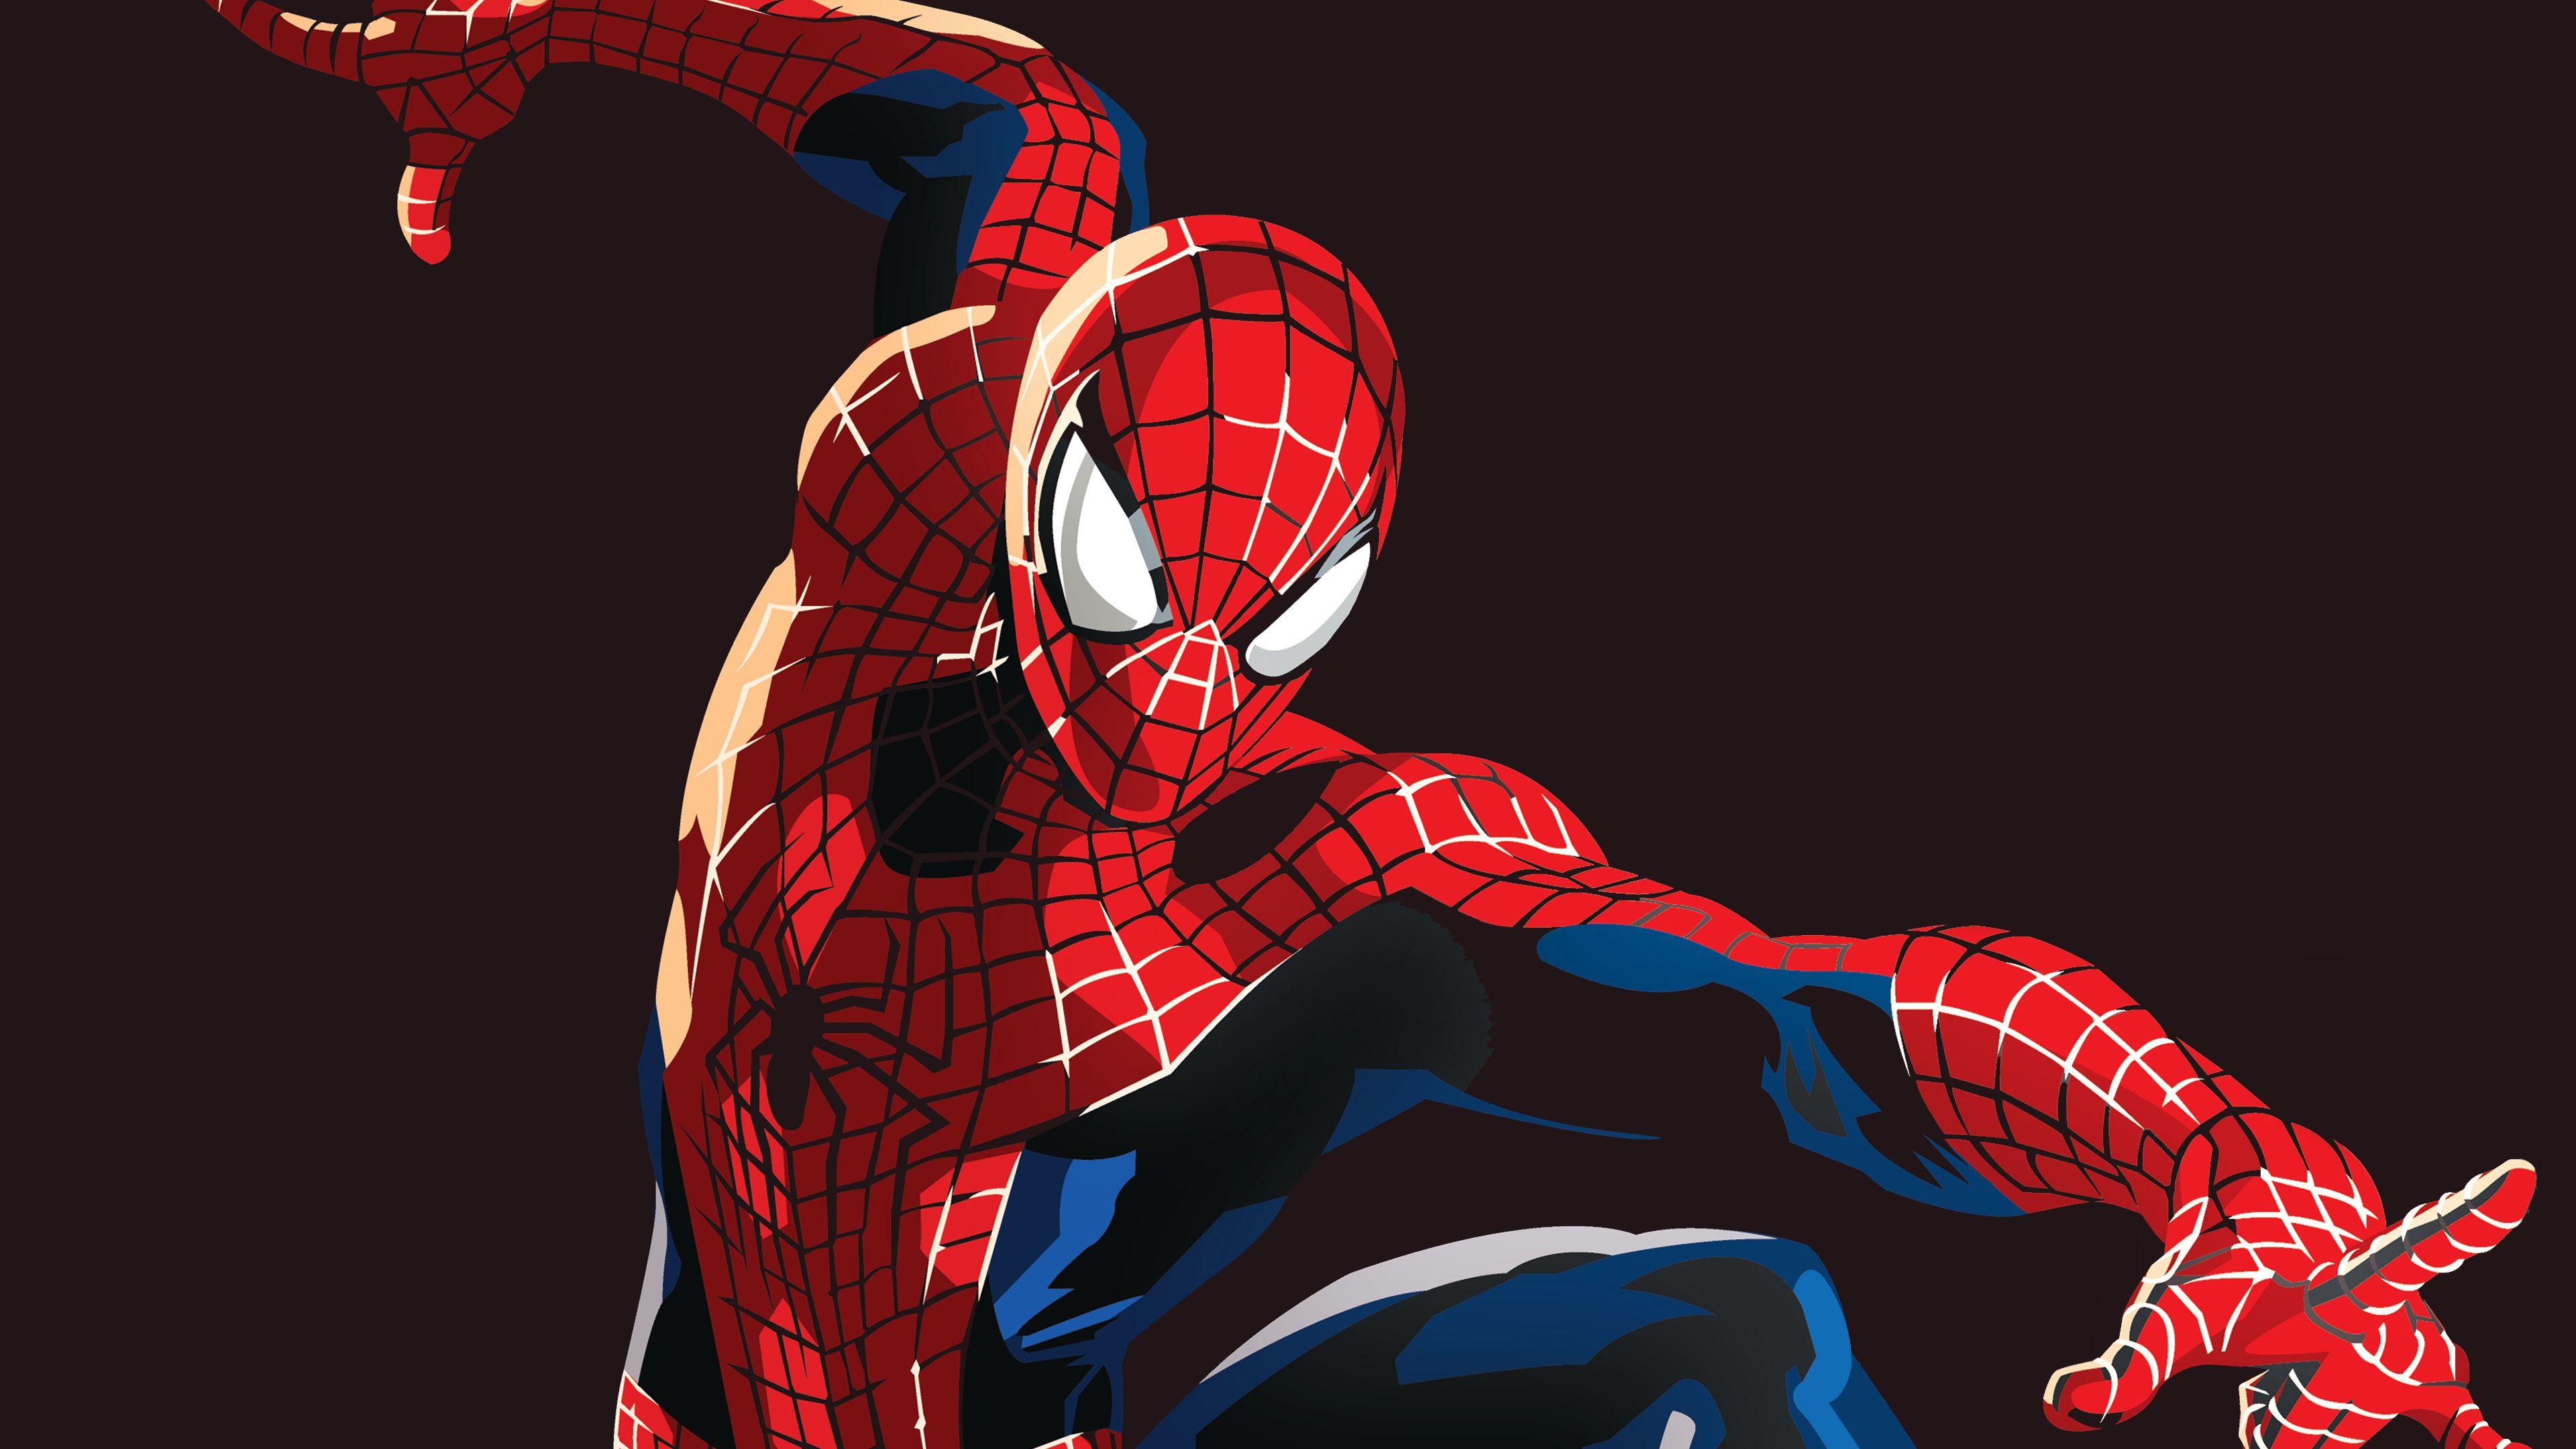 Spiderman Graphic 4k Superheroes Wallpapers Spiderman Wallpapers Hd Wallpapers Digital Art Wallpapers Behance Wal Spiderman Art Wallpaper Android Wallpaper